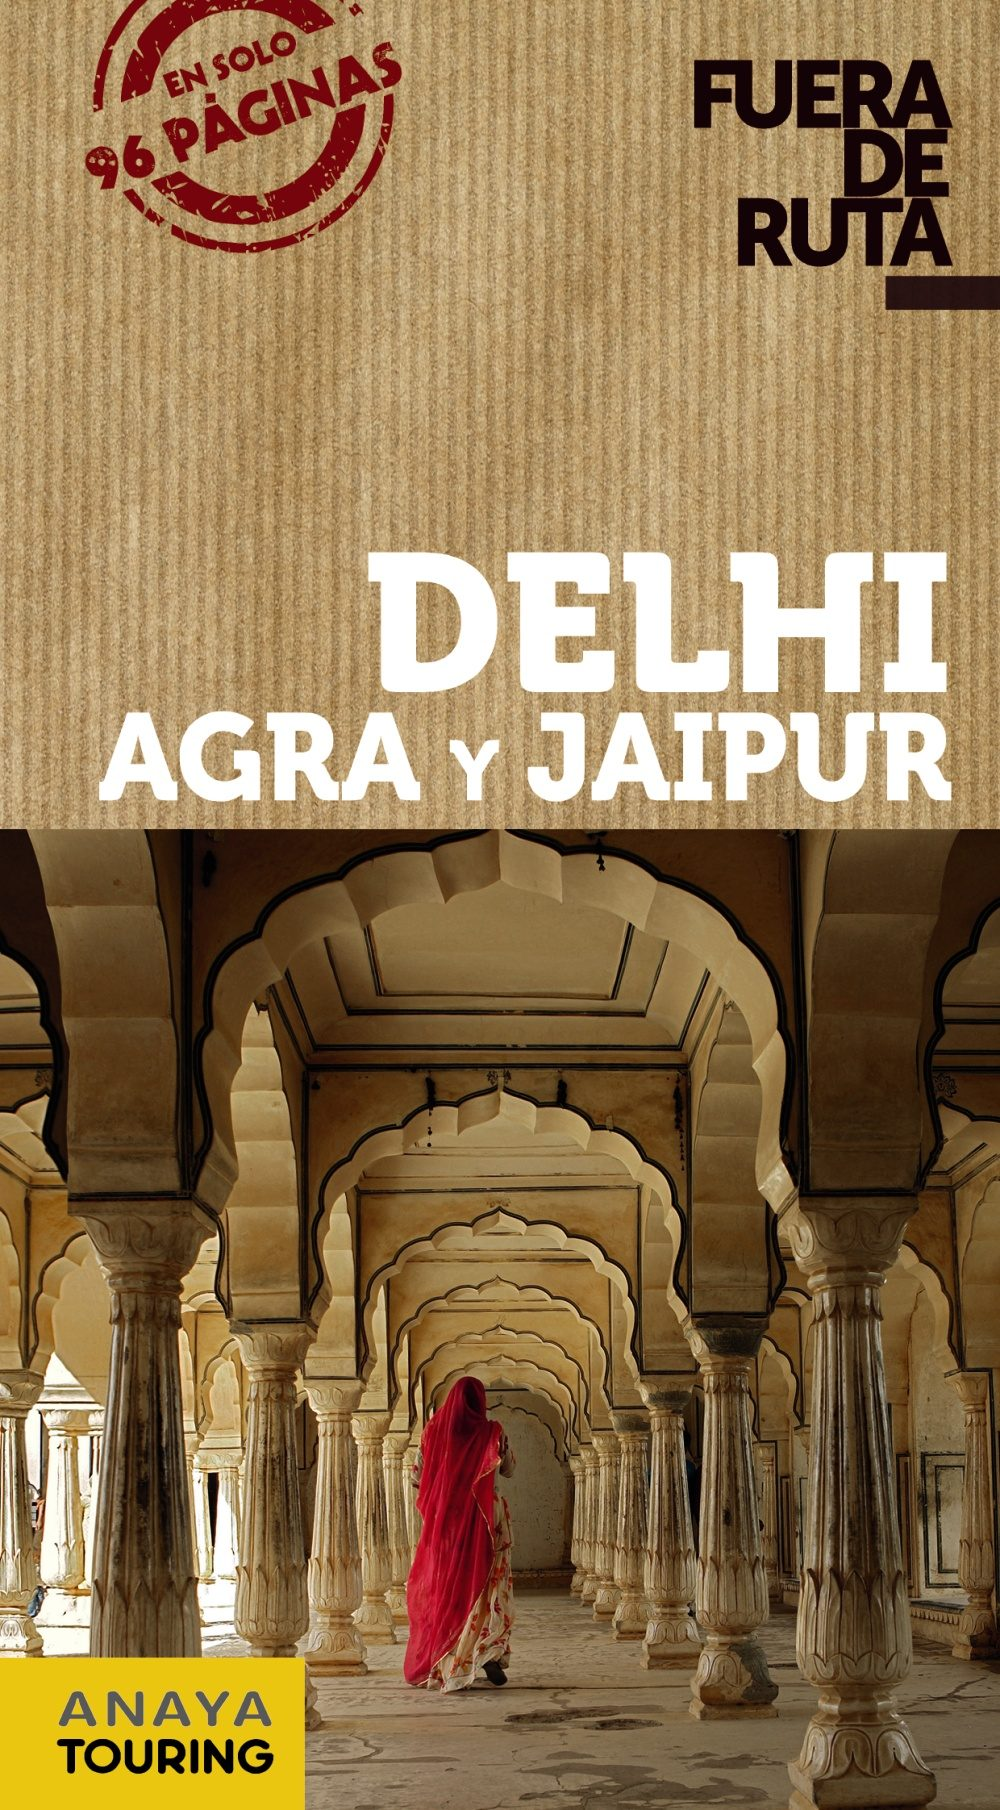 Delhi, Agra Y Jaipur 2017 (fuera De Ruta) 2ª Ed. por Eva Alba